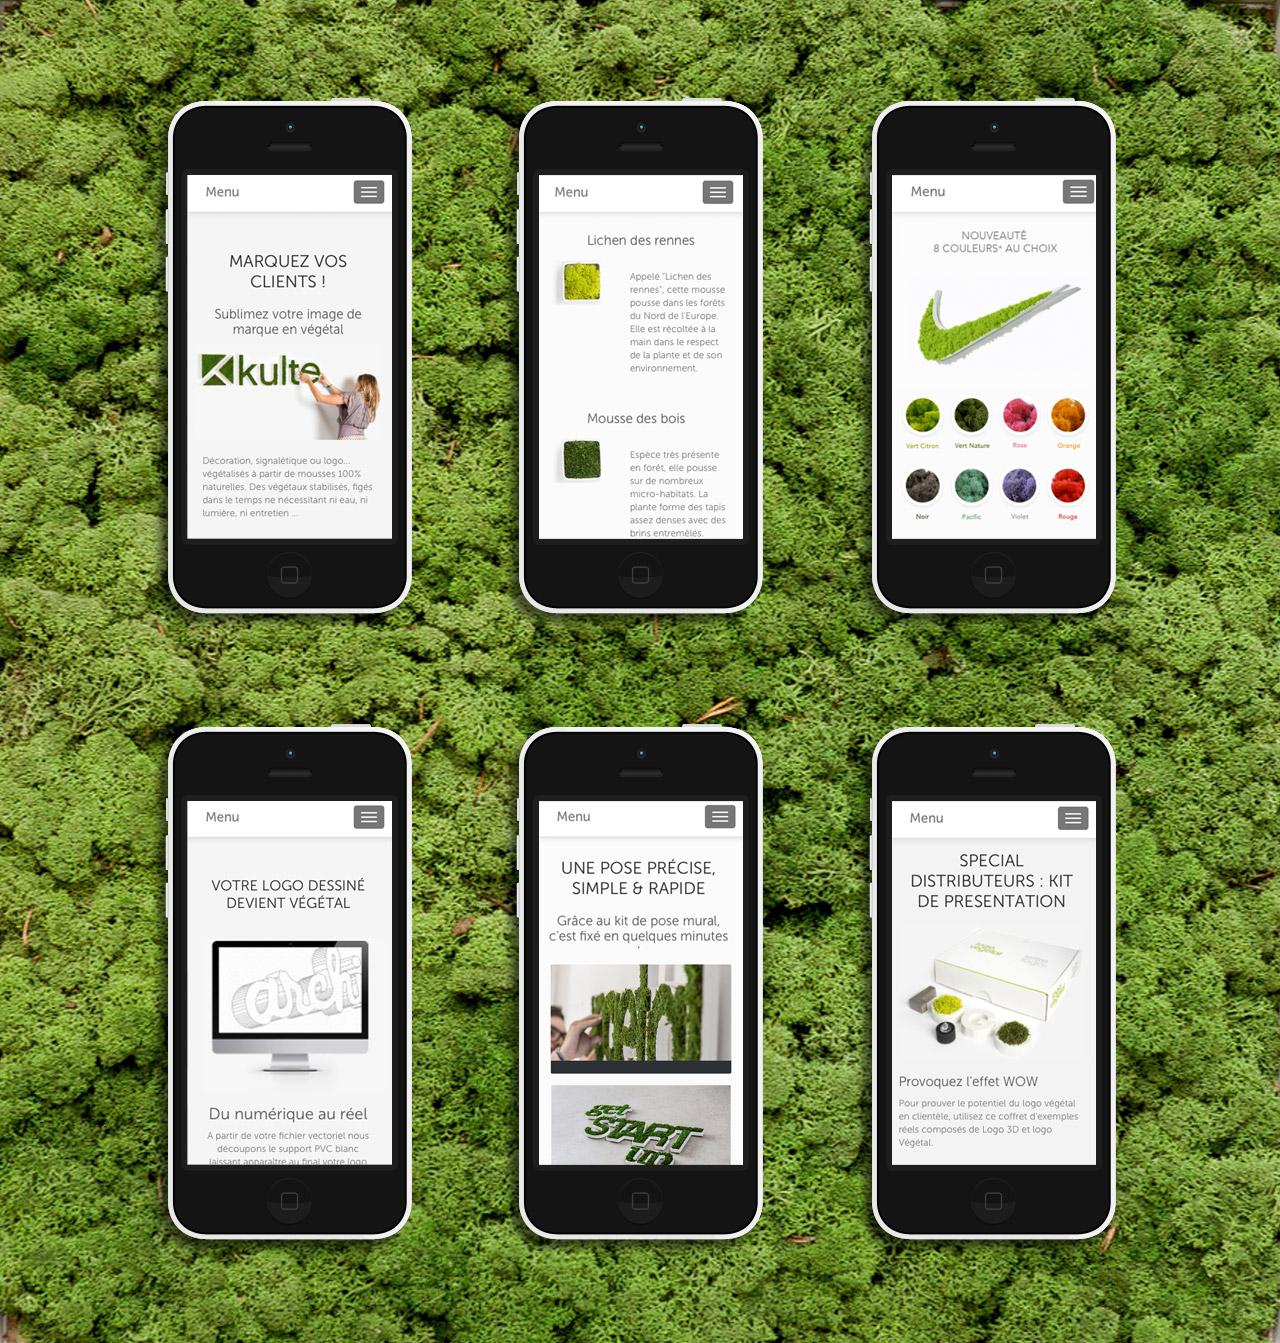 logo-vegetal-site-mobile-responsive-design-creation-communication-caconcept-alexis-cretin-graphiste